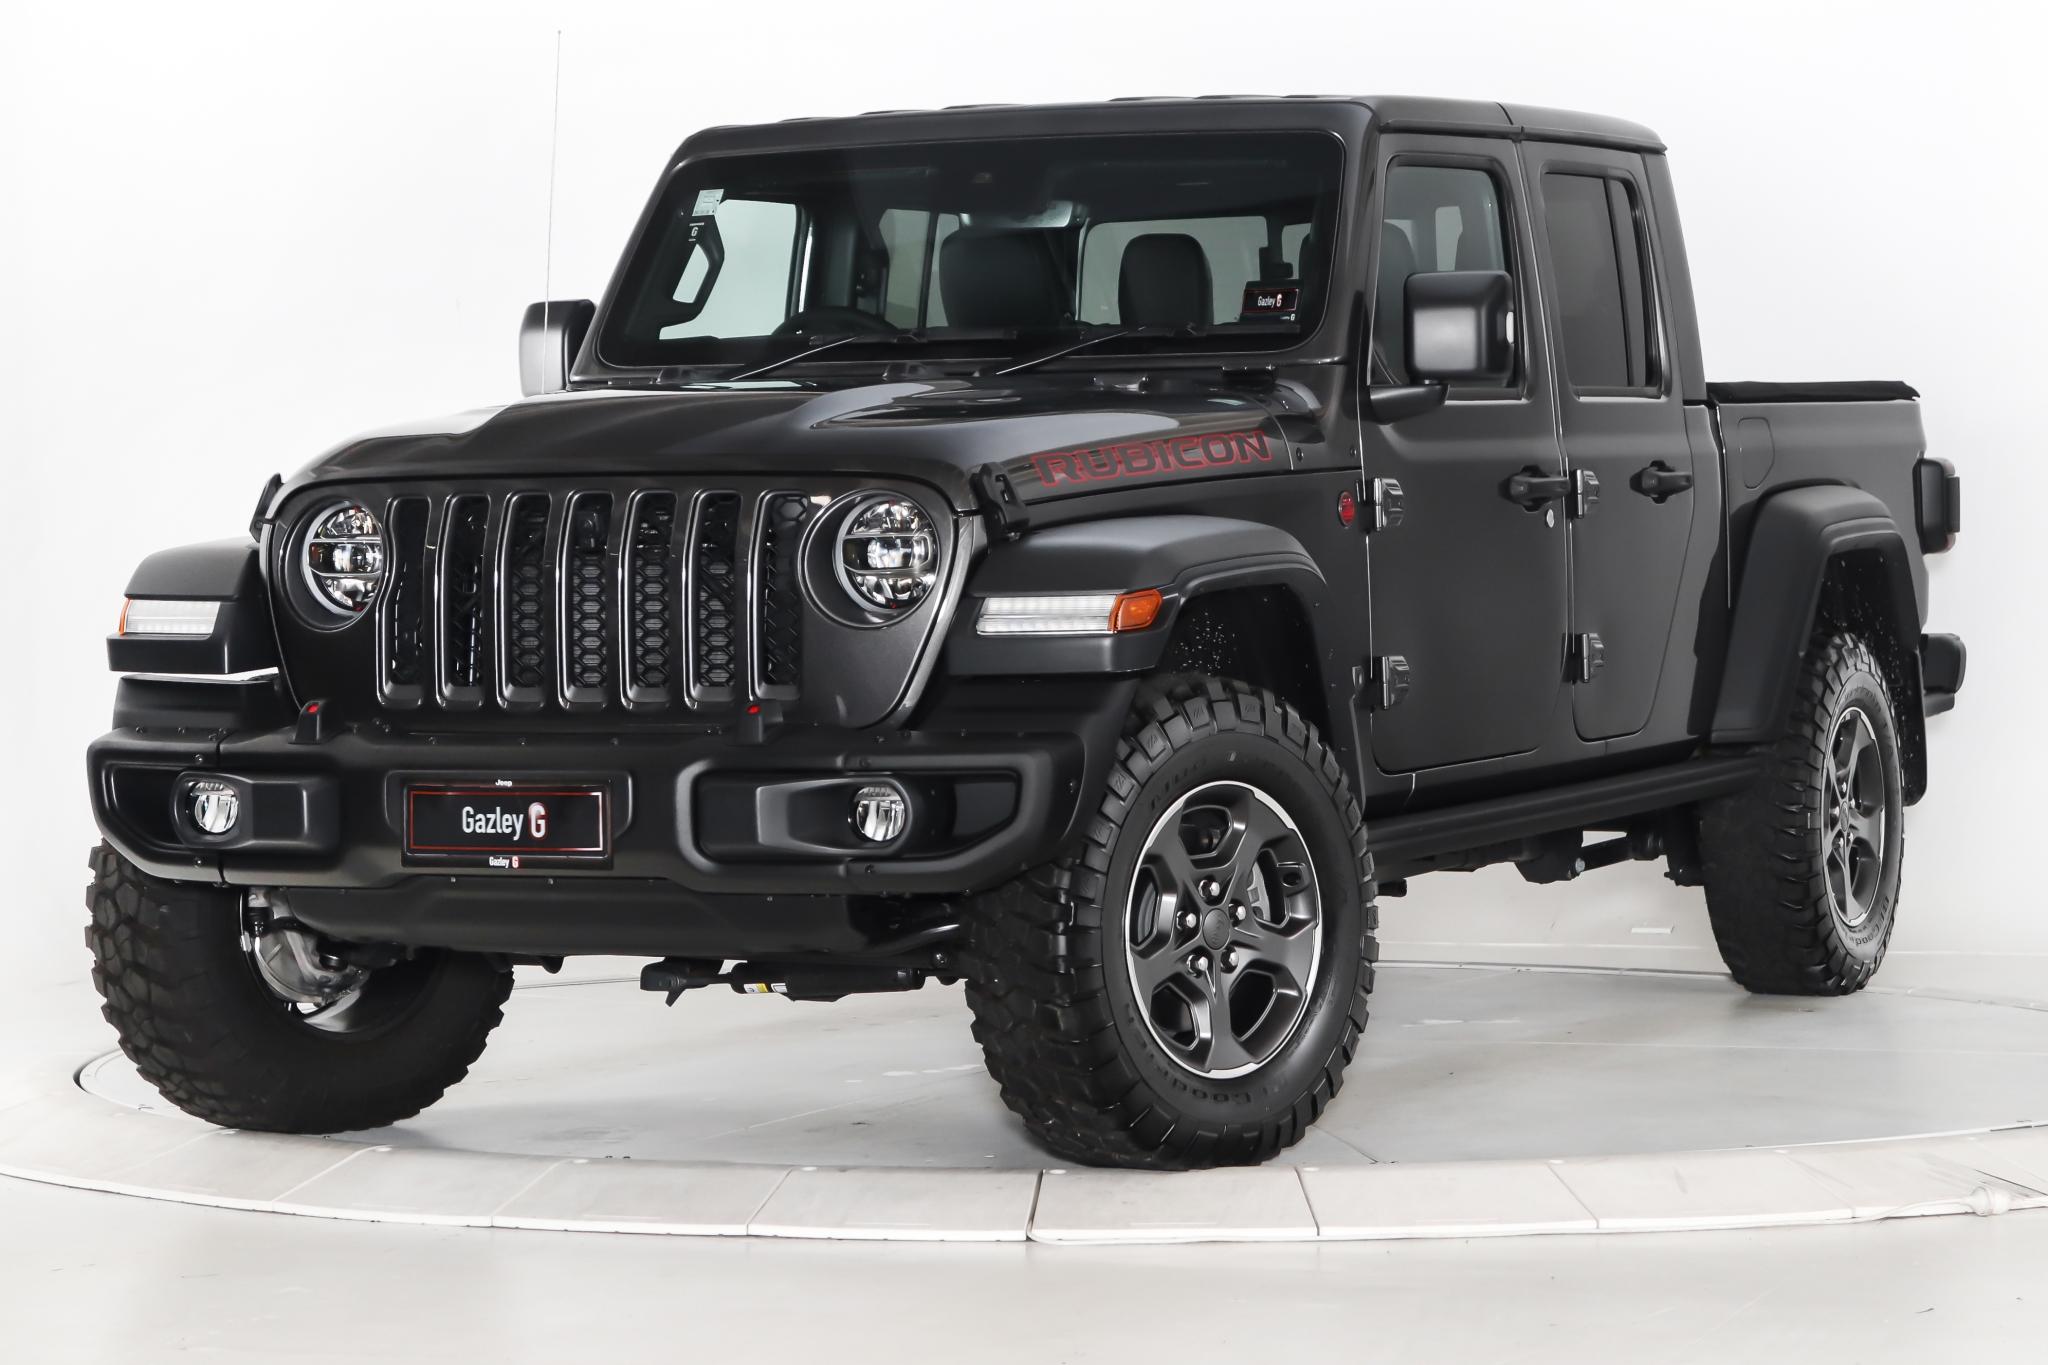 2021 Jeep Gladiator Rubicon 4WD